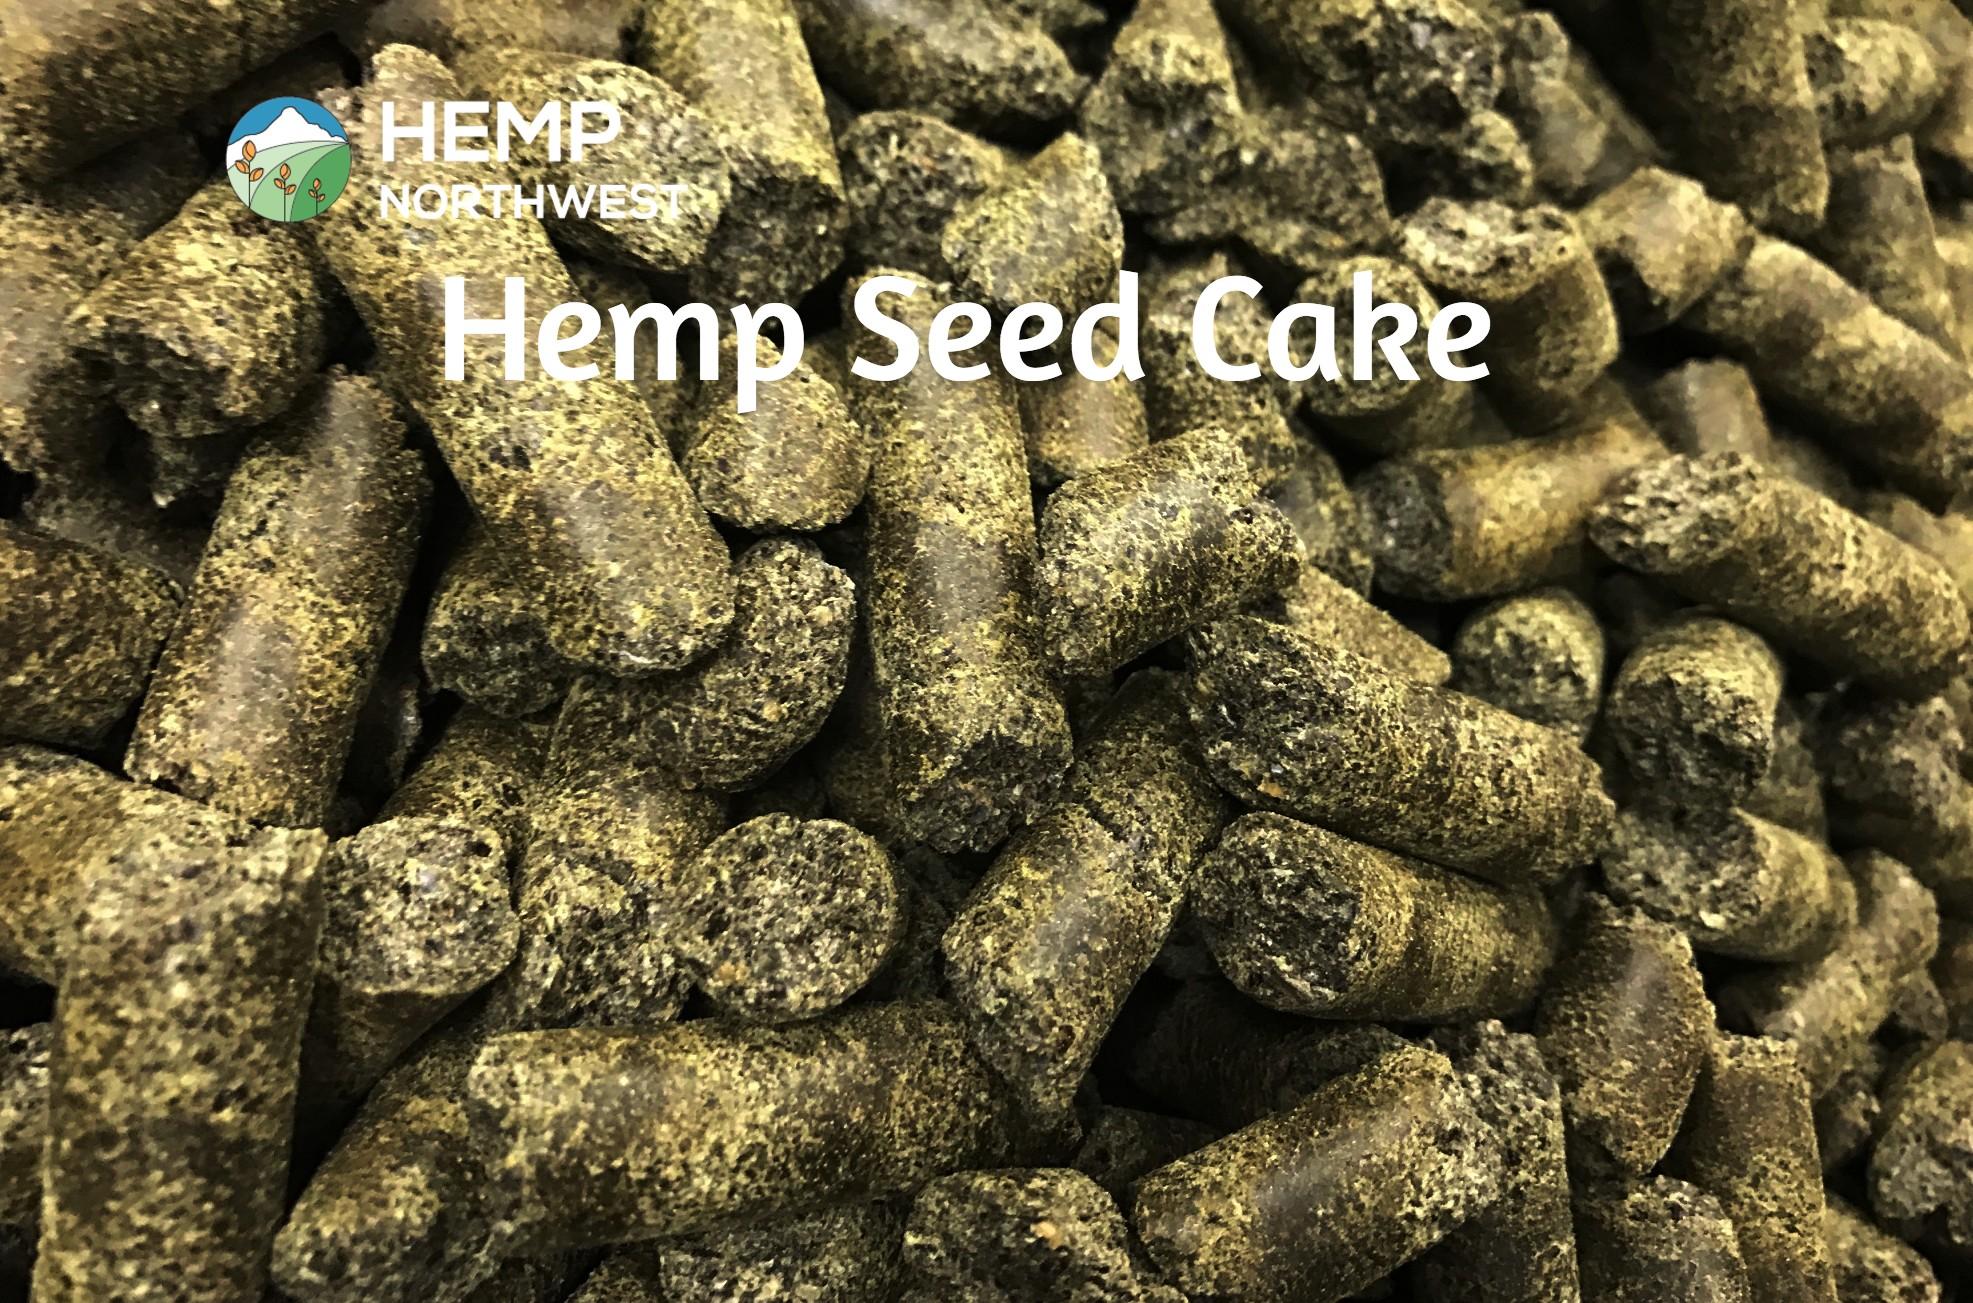 American Grown Hemp Seed Cake freshly pressed in Oregon at the Hemp Northwest Facility